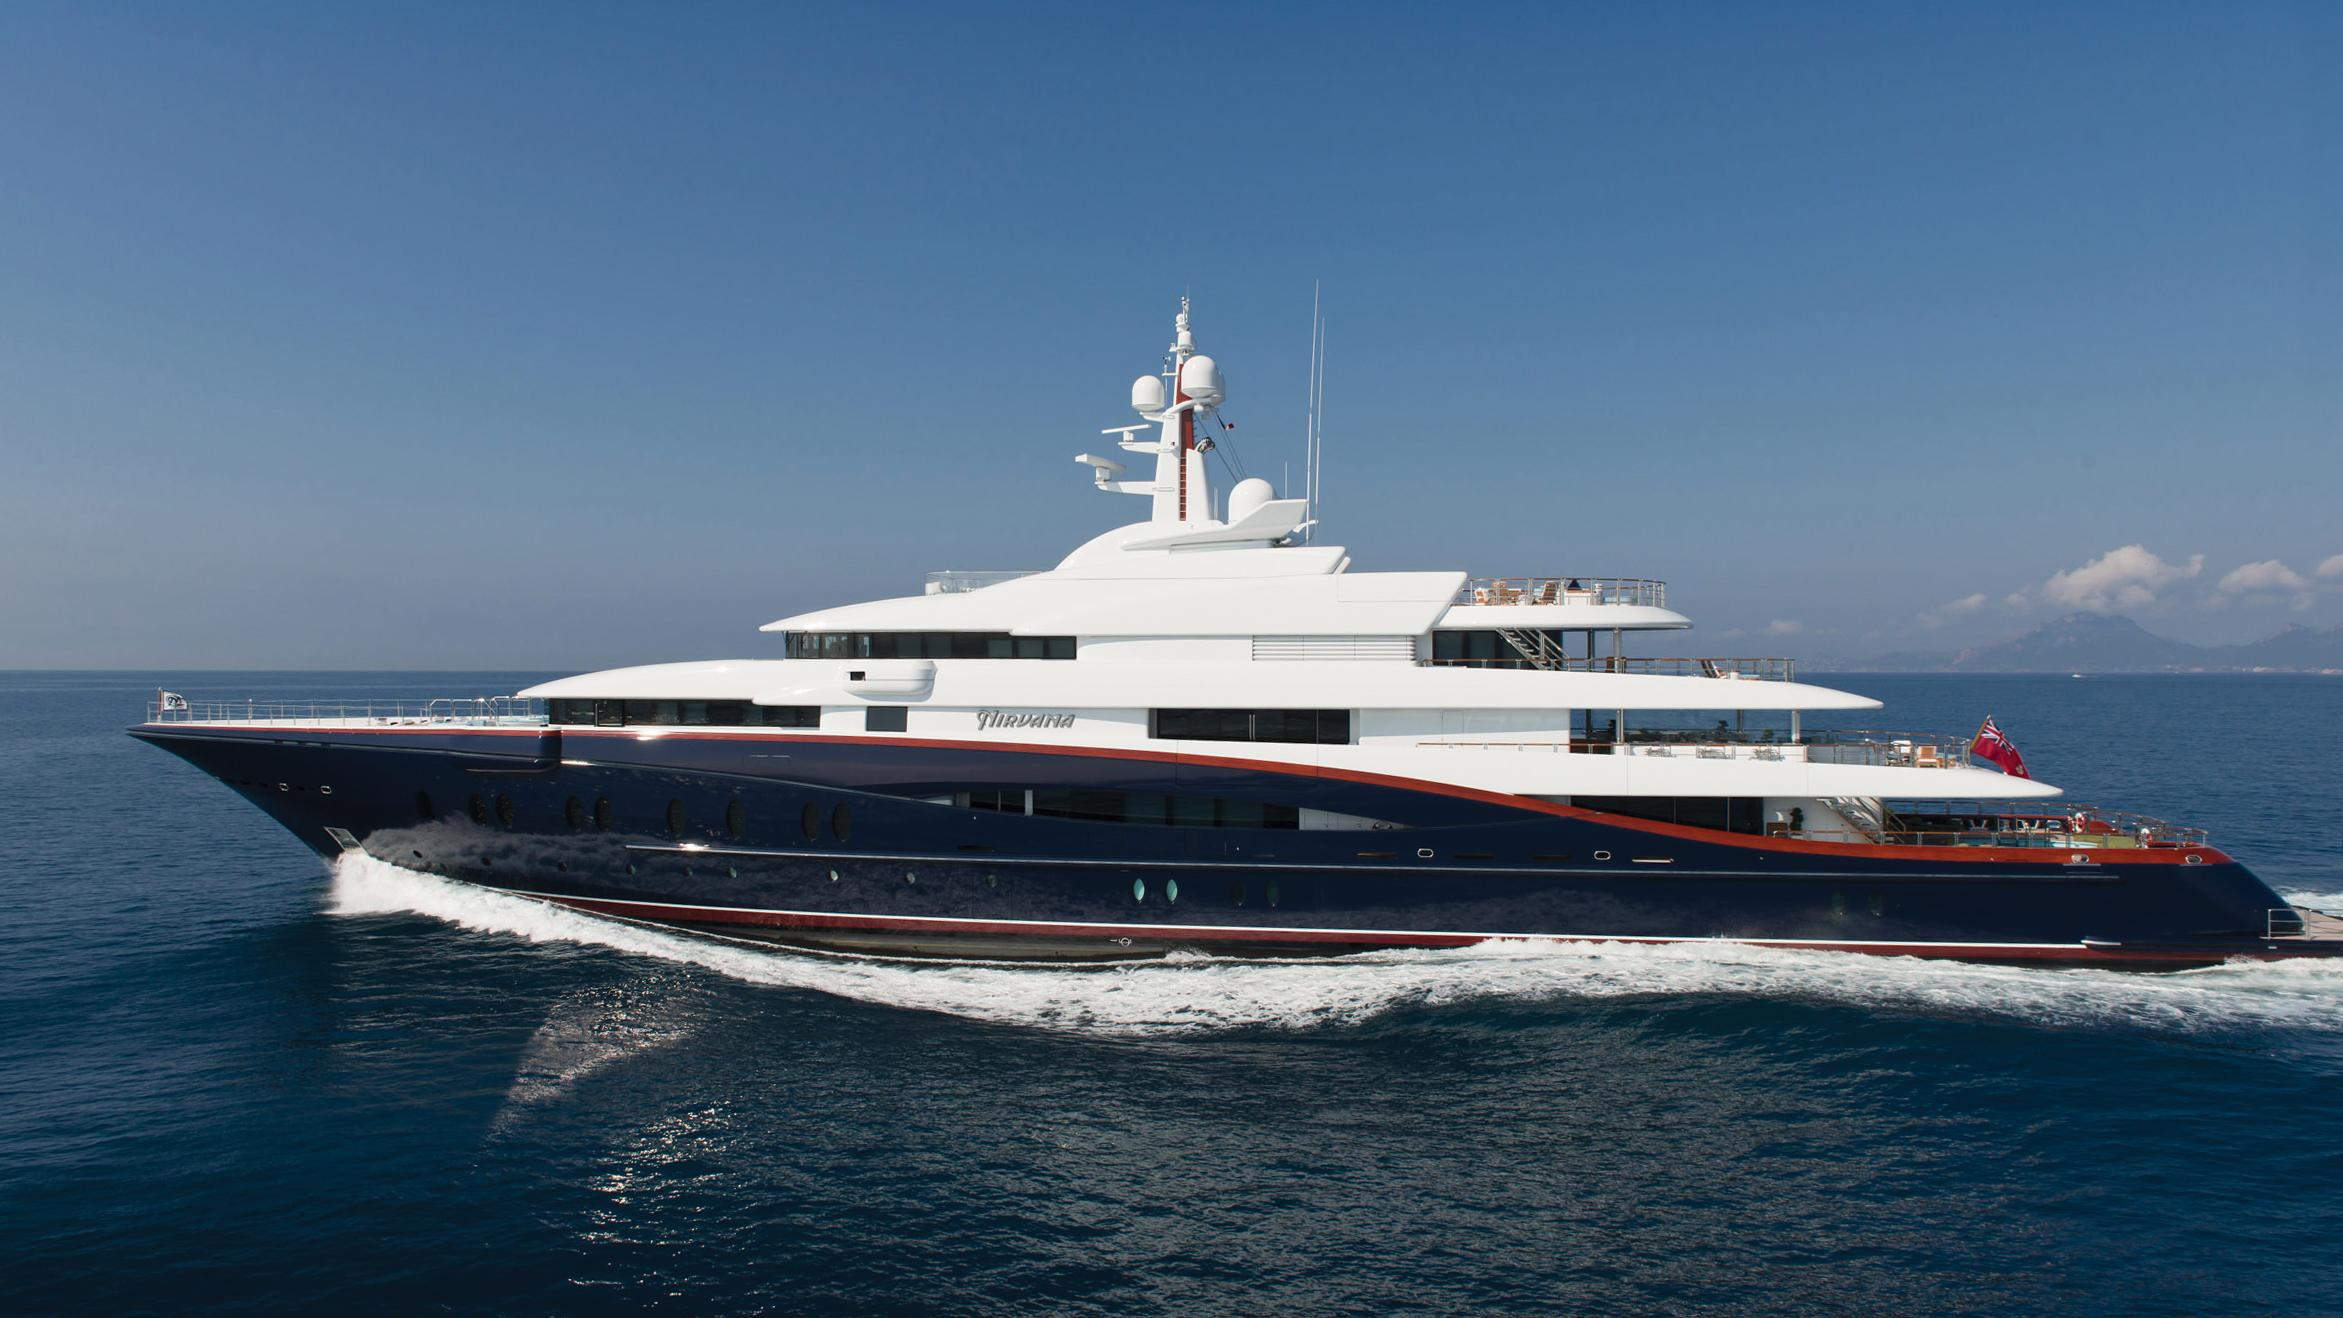 nirvana-motor-yacht-oceanco-2012-88m-profile-cruising